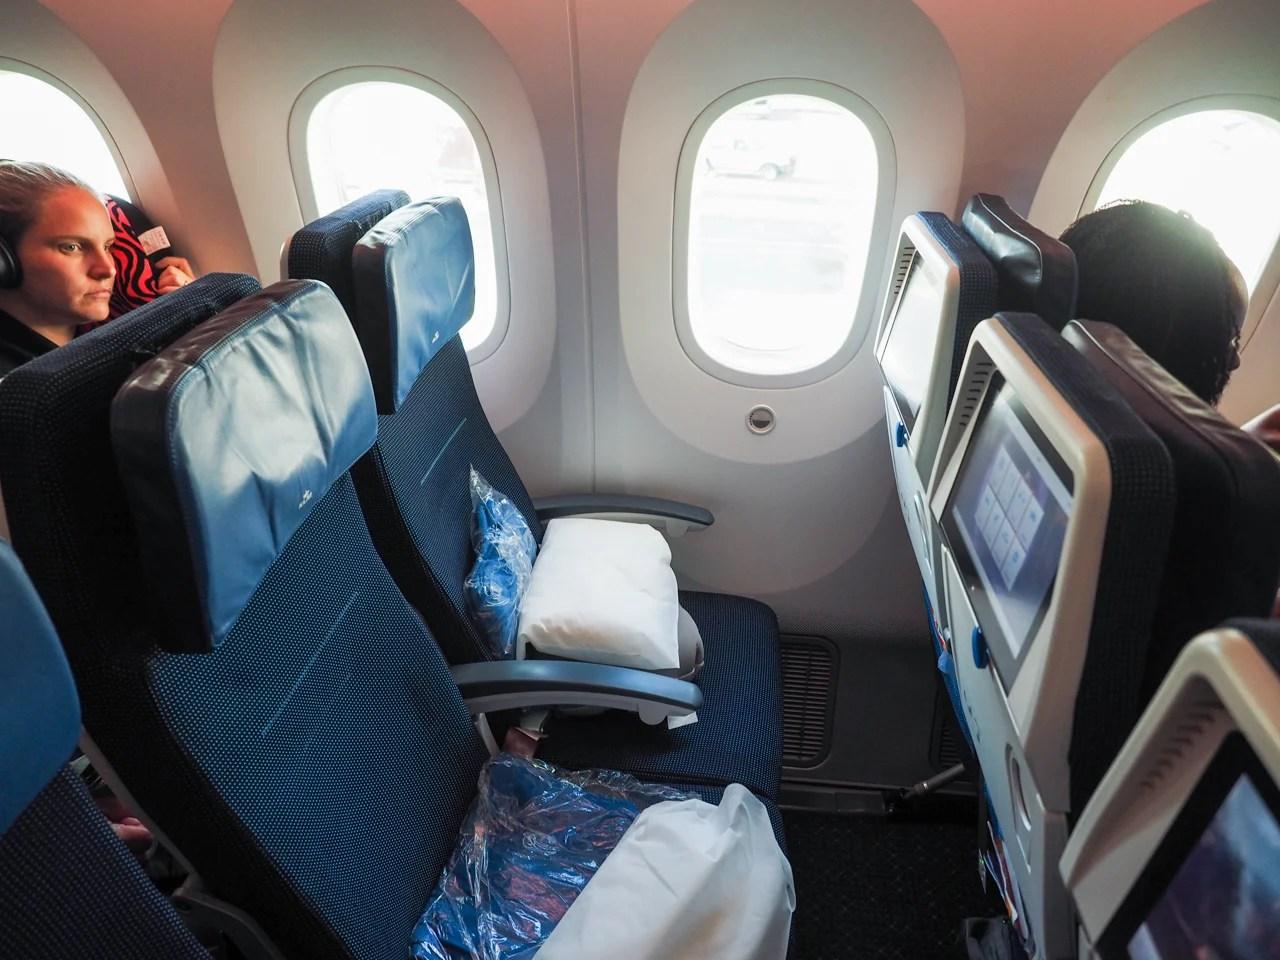 Sensational Review Klm 787 9 In Economy From New York To Amsterdam Frankydiablos Diy Chair Ideas Frankydiabloscom